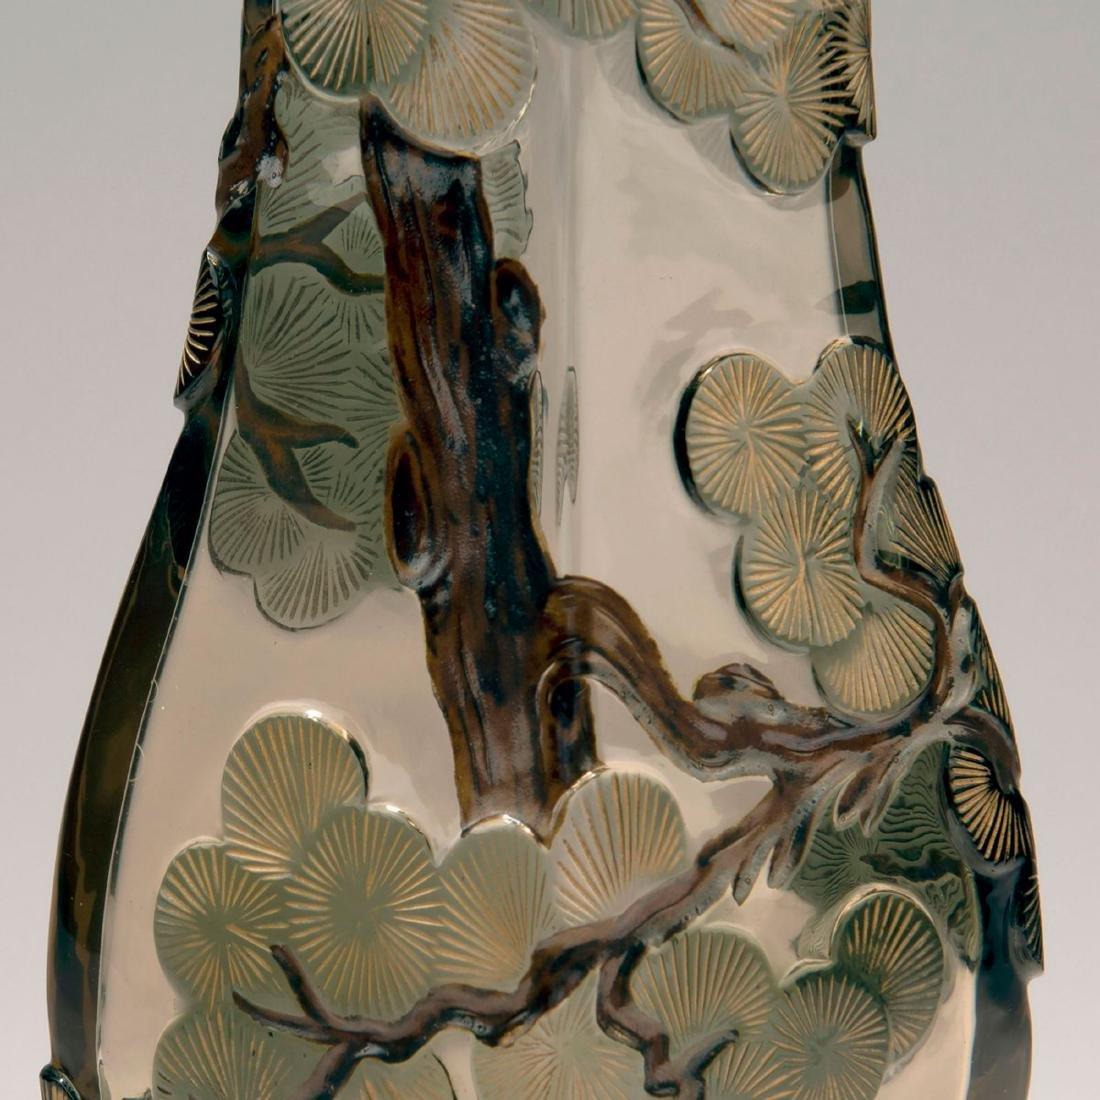 Japonesque vase, 1878-85 - 3